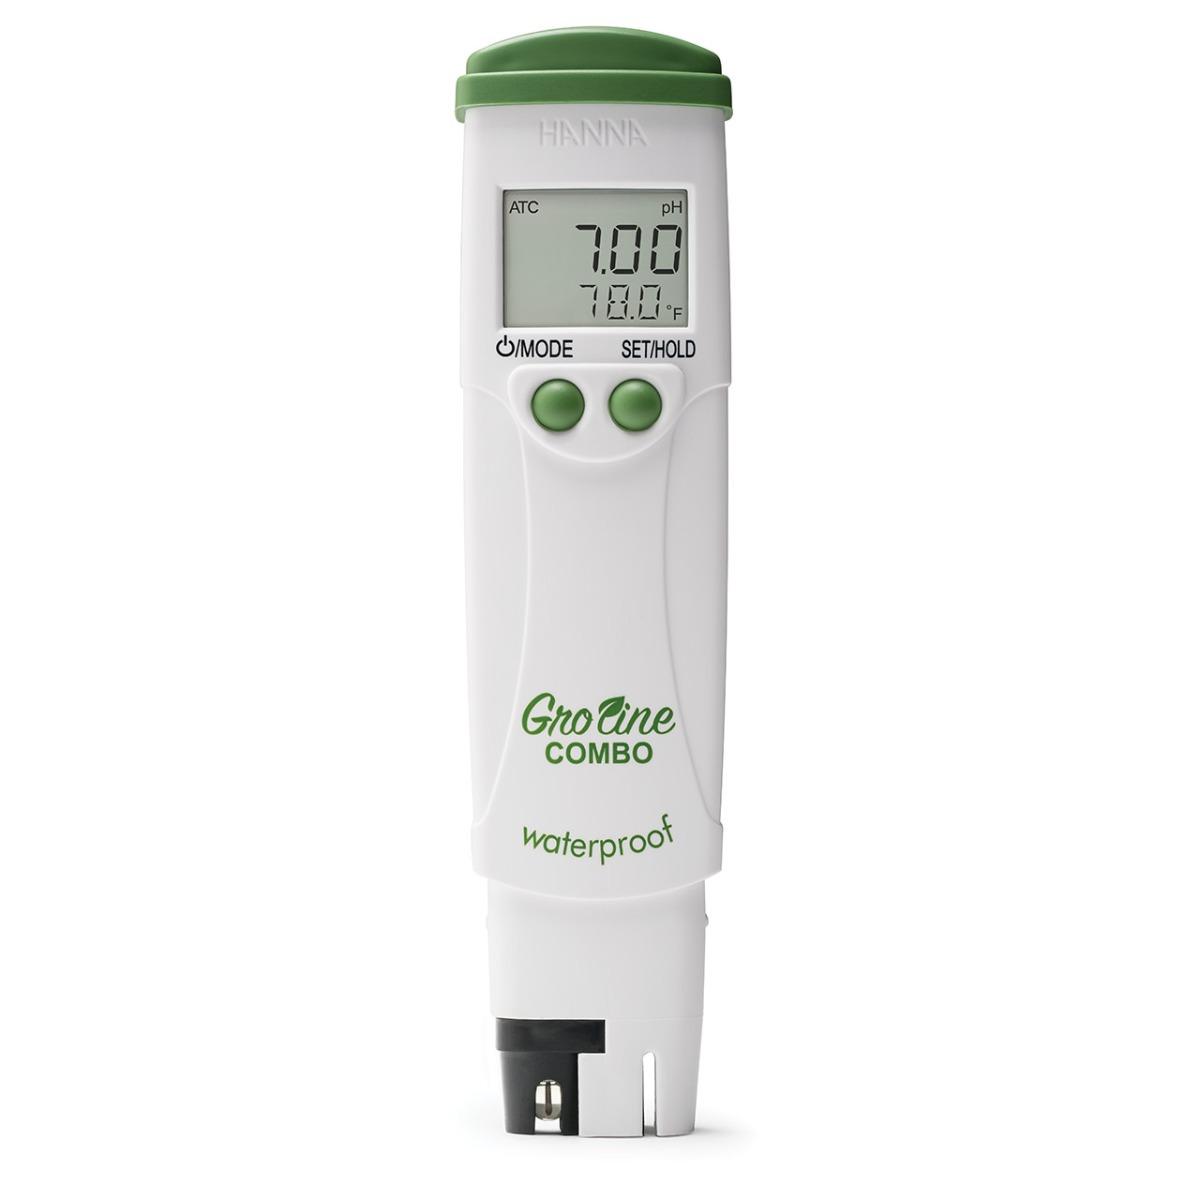 Medidor Portátil e Impermeable de pH / CE / TDS / Temperatura para Hidroponía GroLine - HI98131